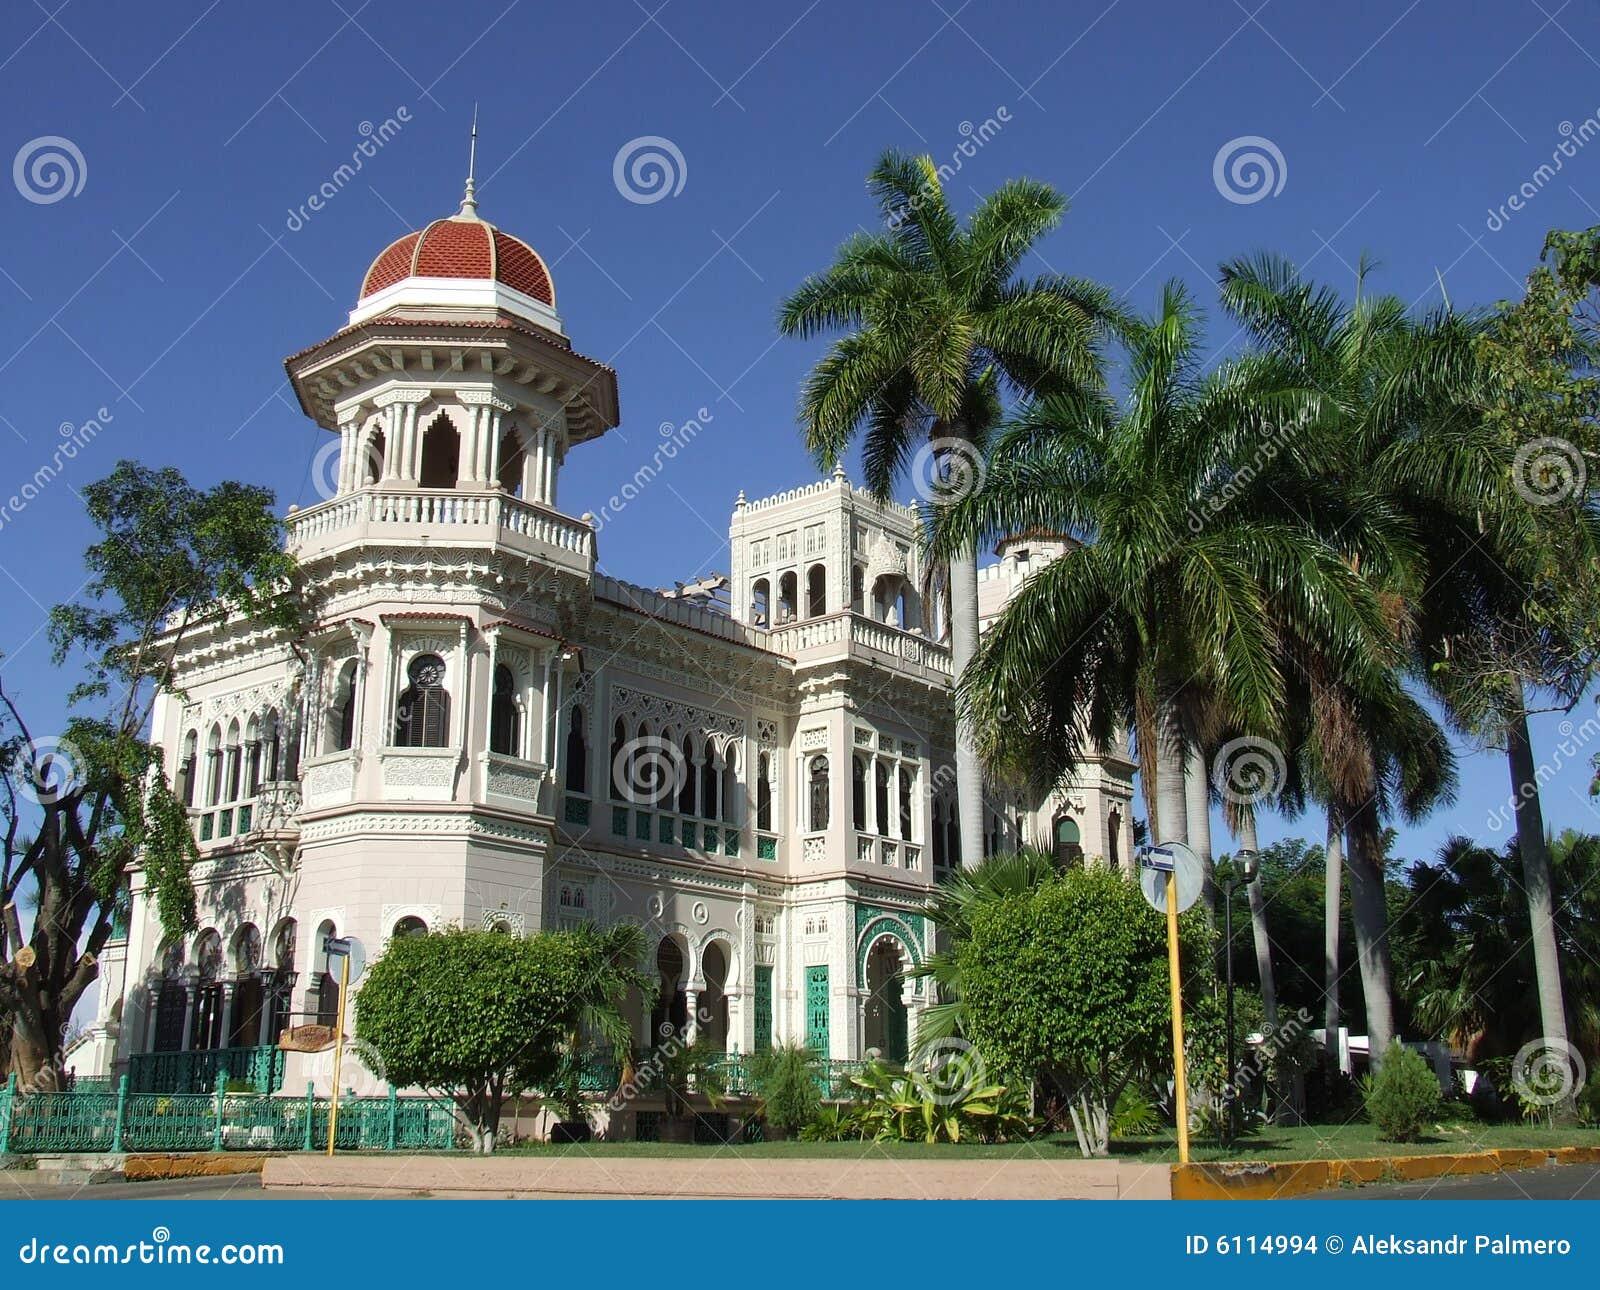 Beautiful palace in Cienfuegos